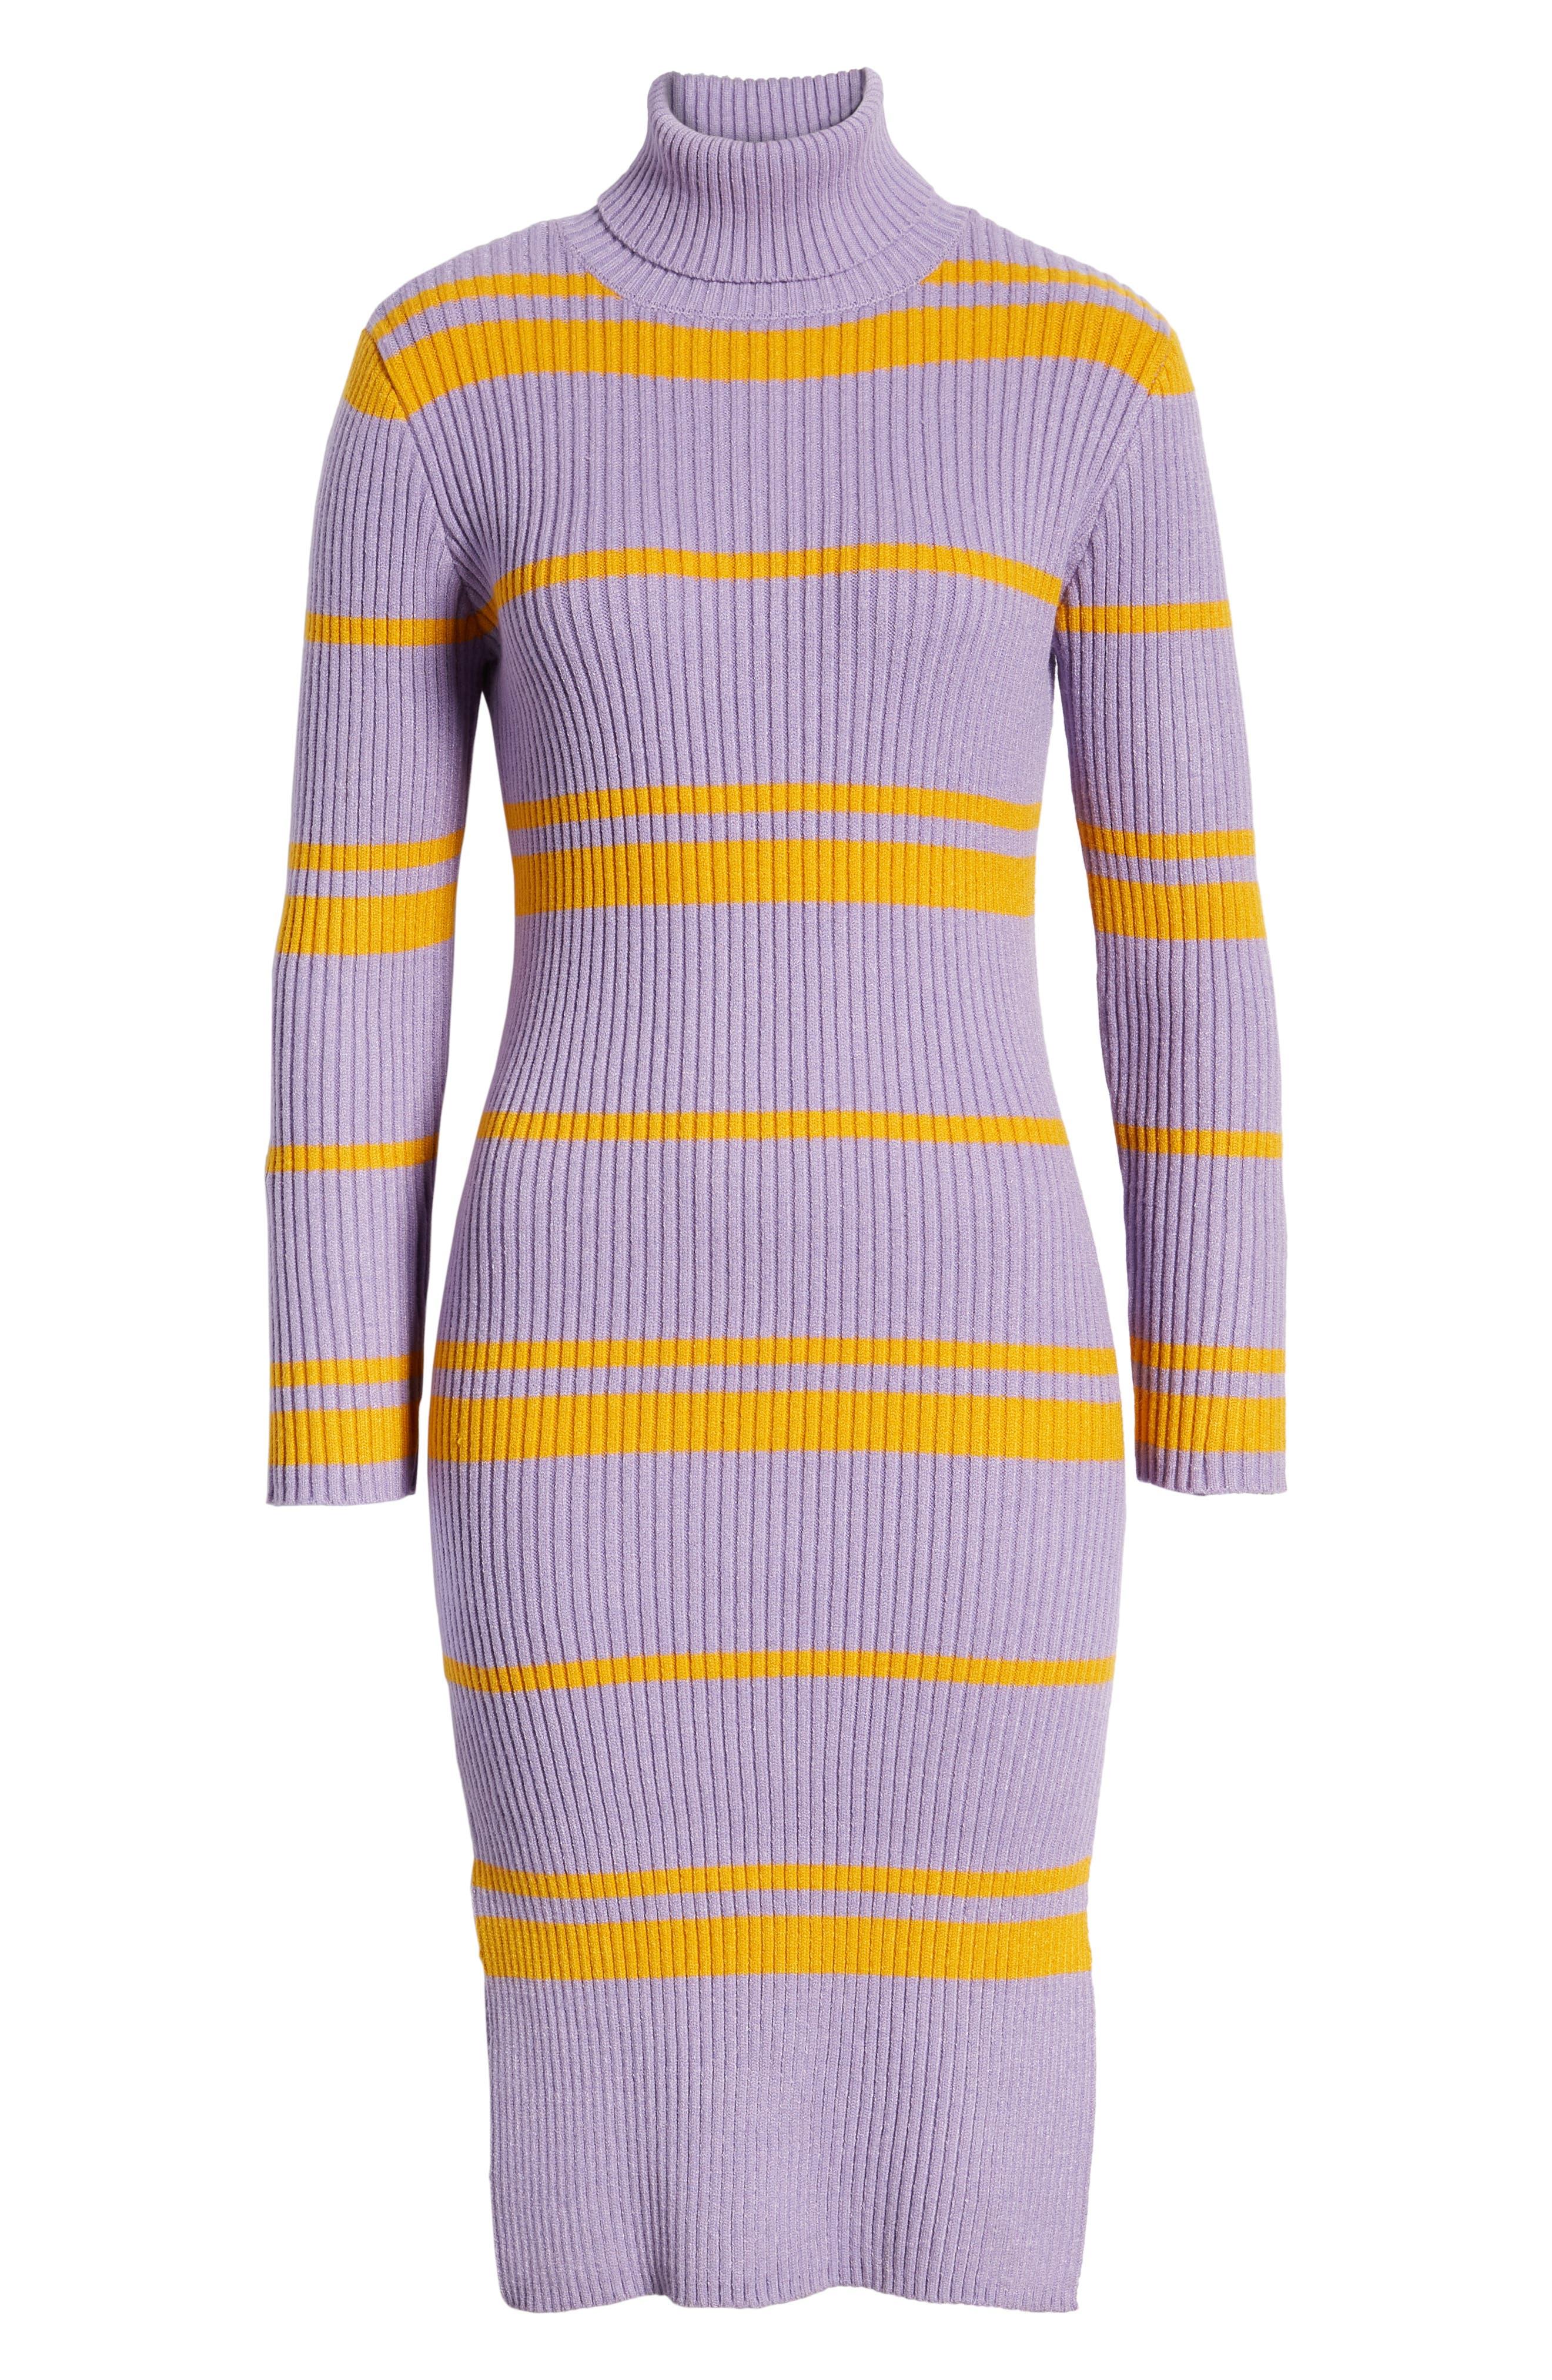 MOON RIVER, Stripe Turtleneck Sweater Dress, Alternate thumbnail 7, color, 500